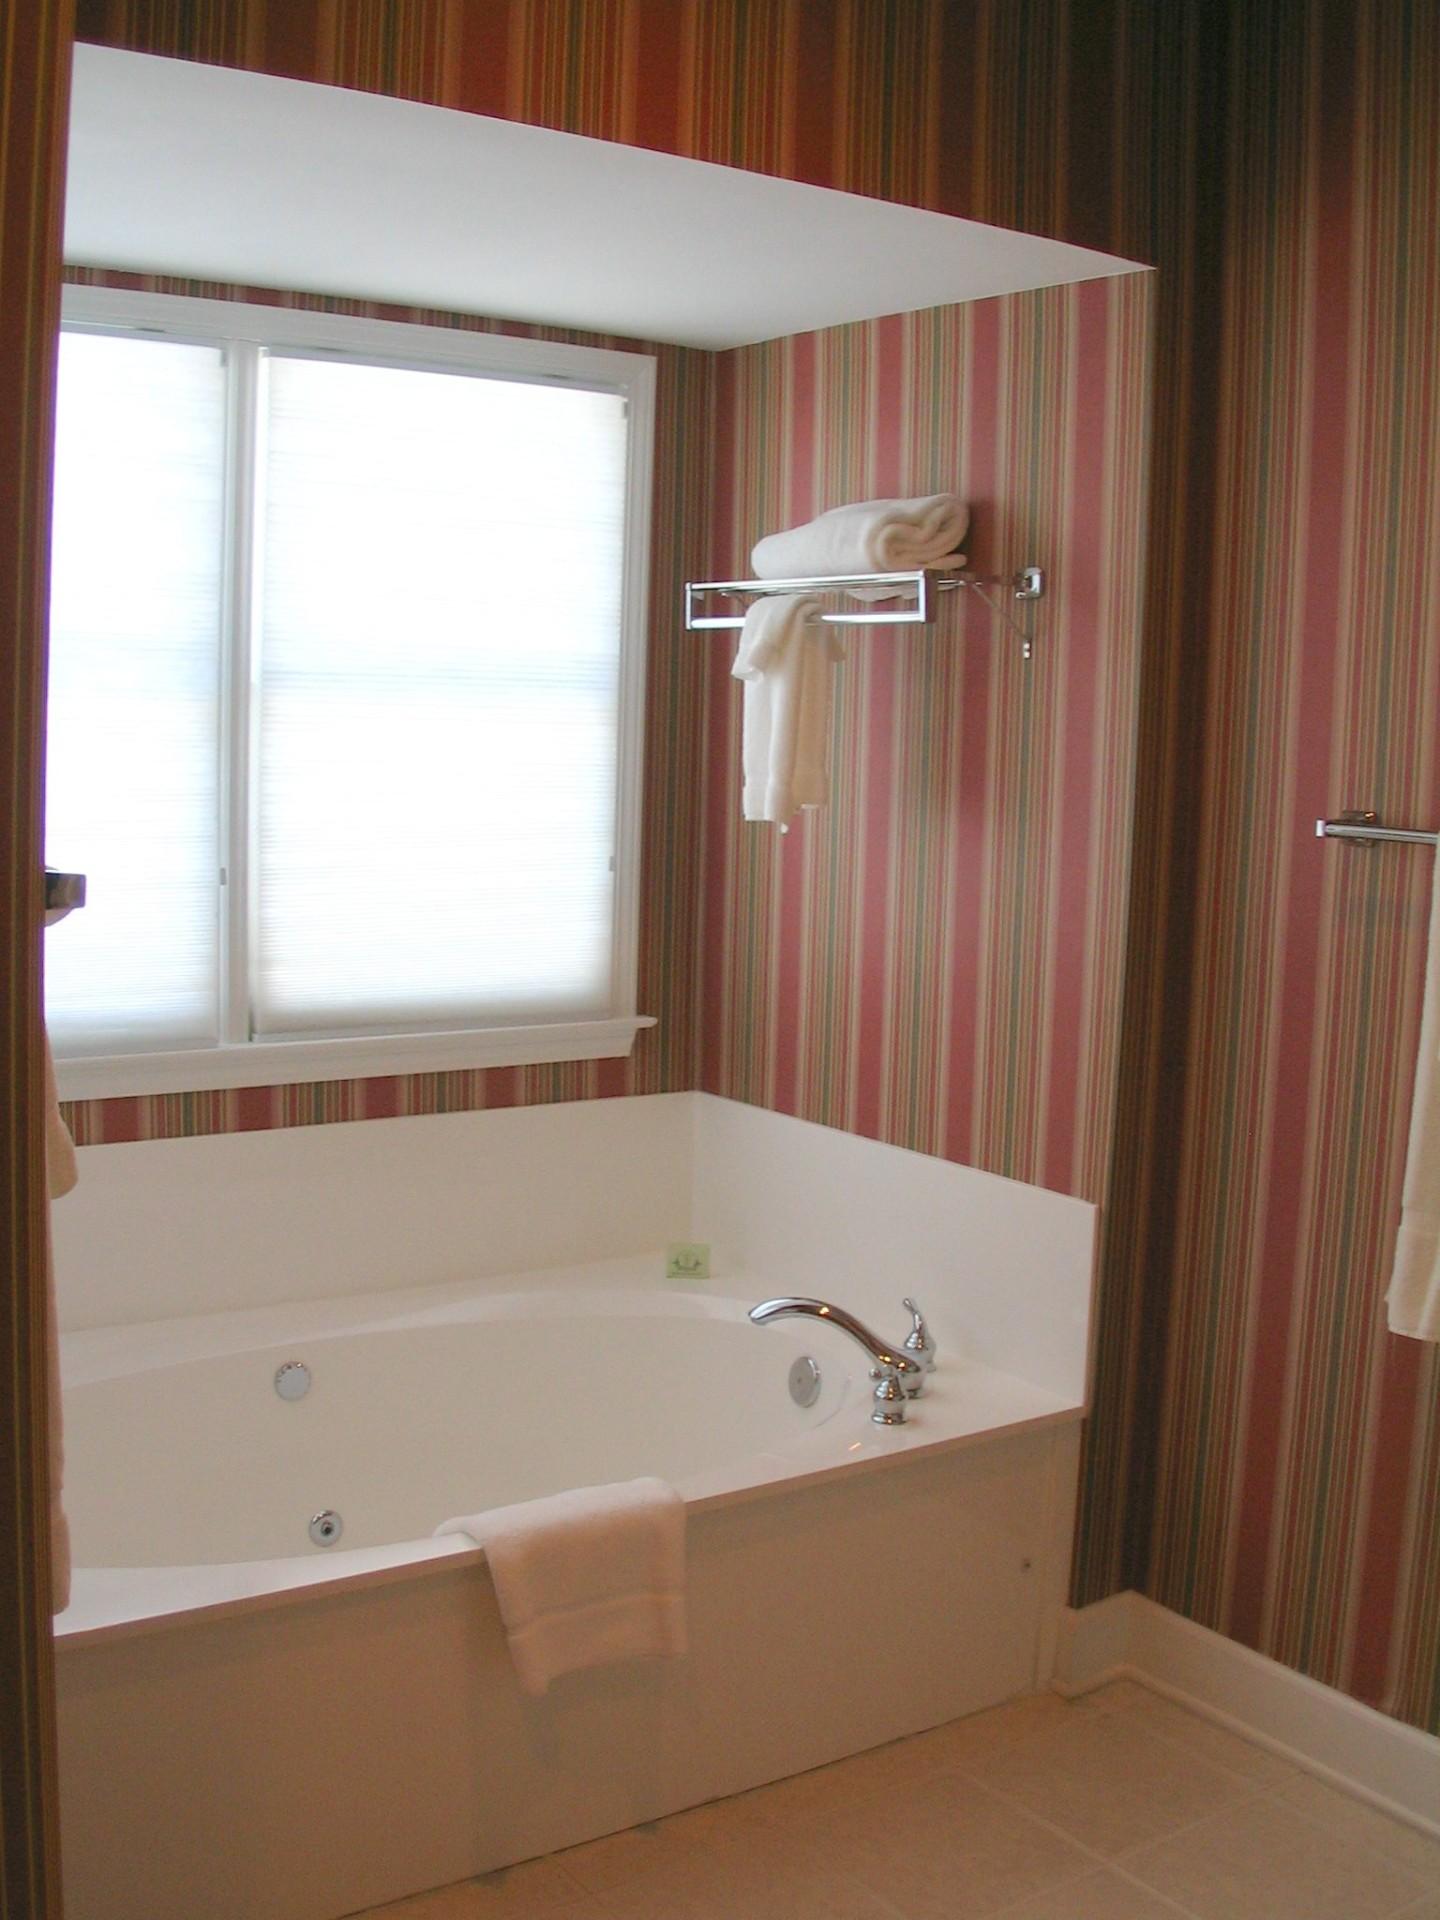 Jacuzzi in Master Bath